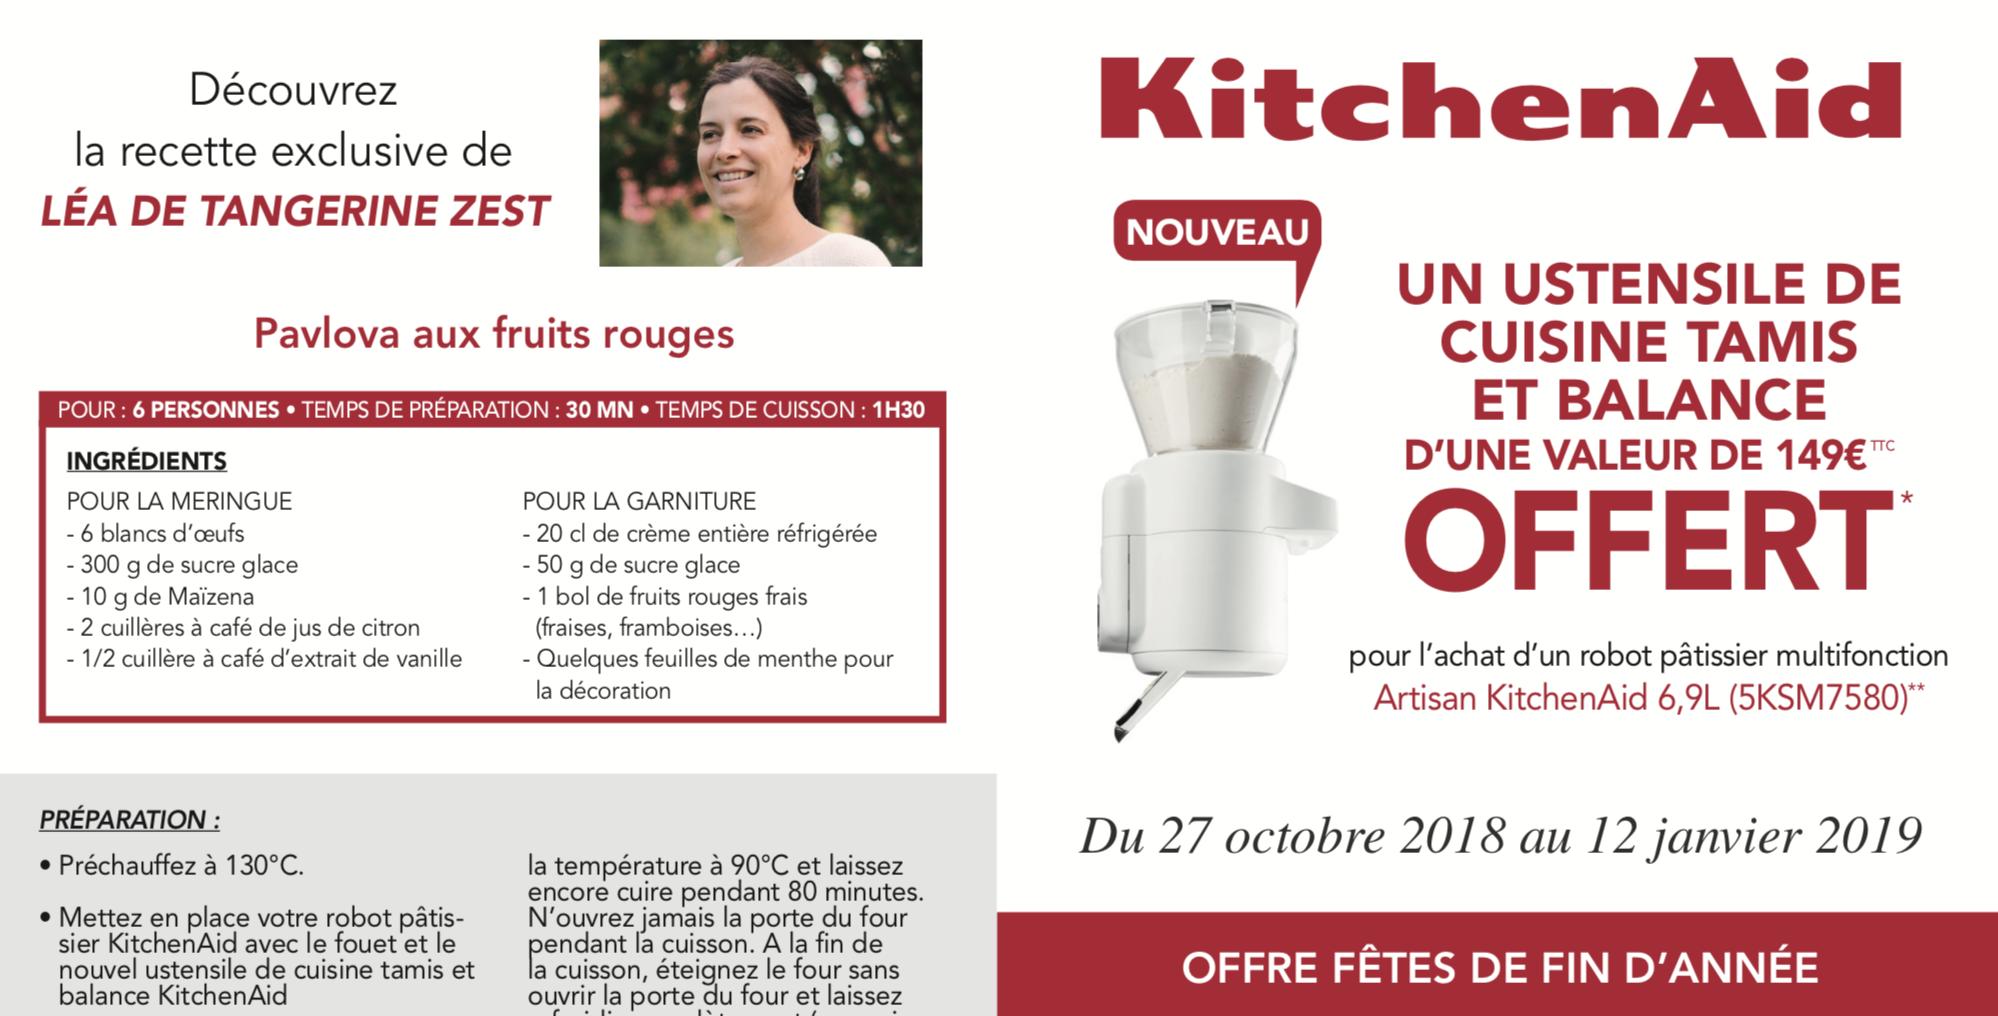 Offre KitchenAid